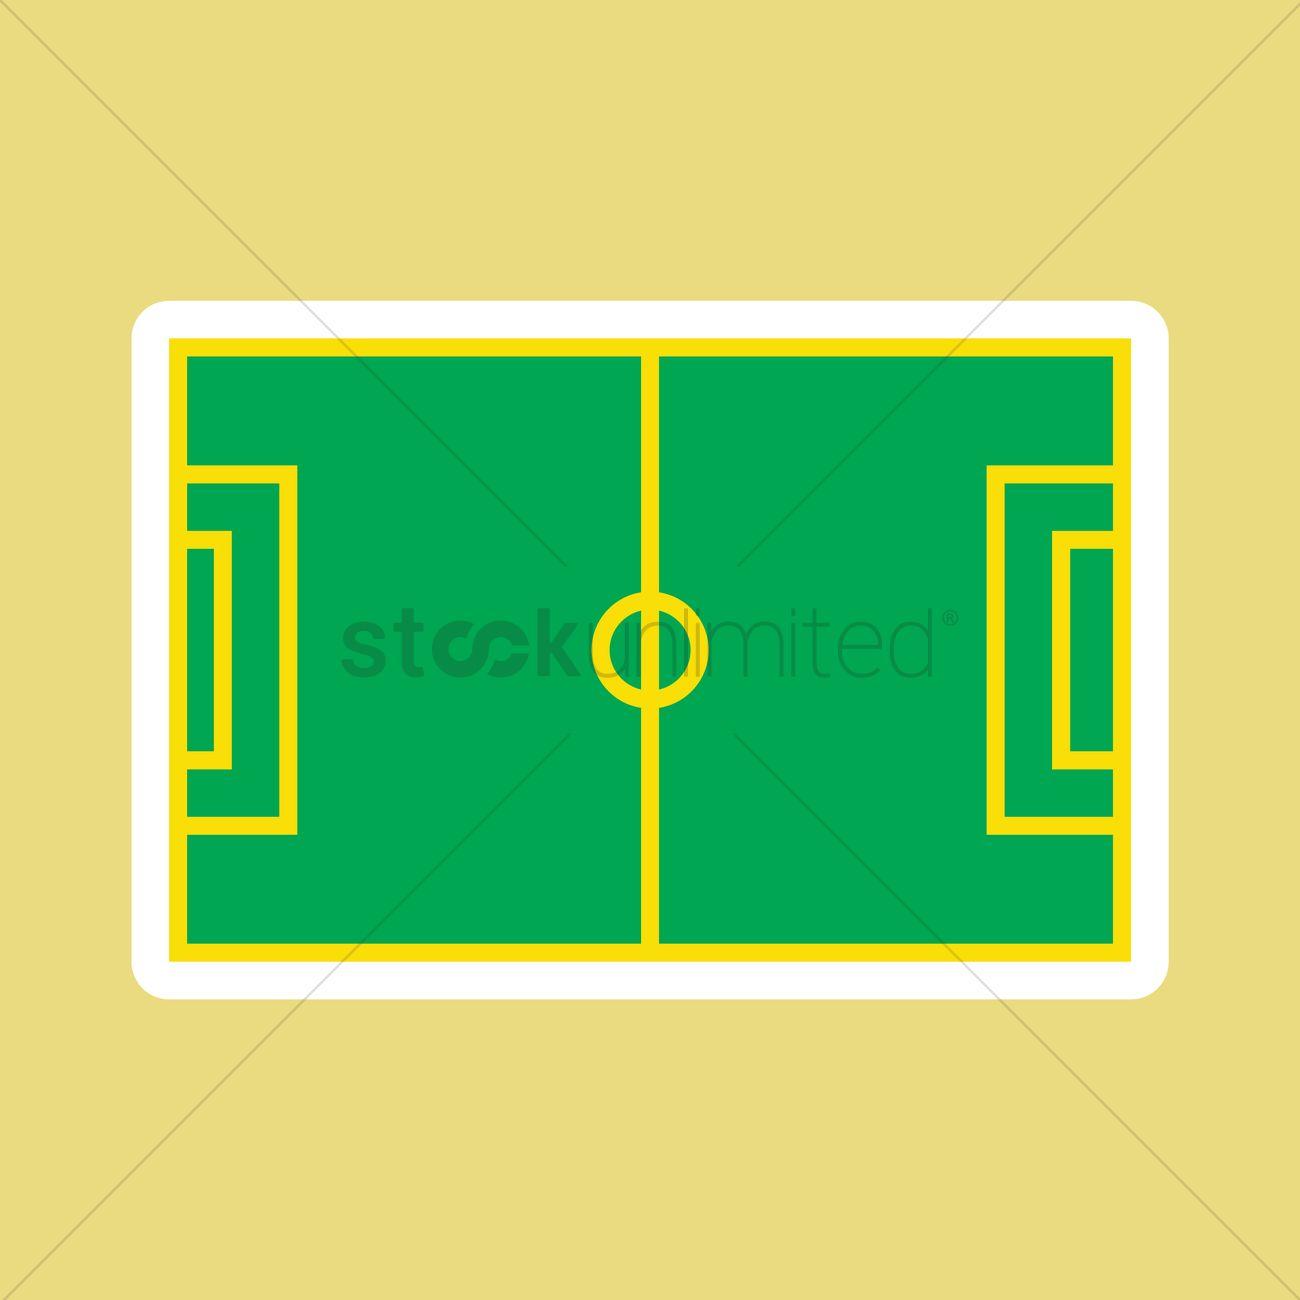 football field vector image 1571633 stockunlimited rh stockunlimited com football field vector free download football field clipart vector